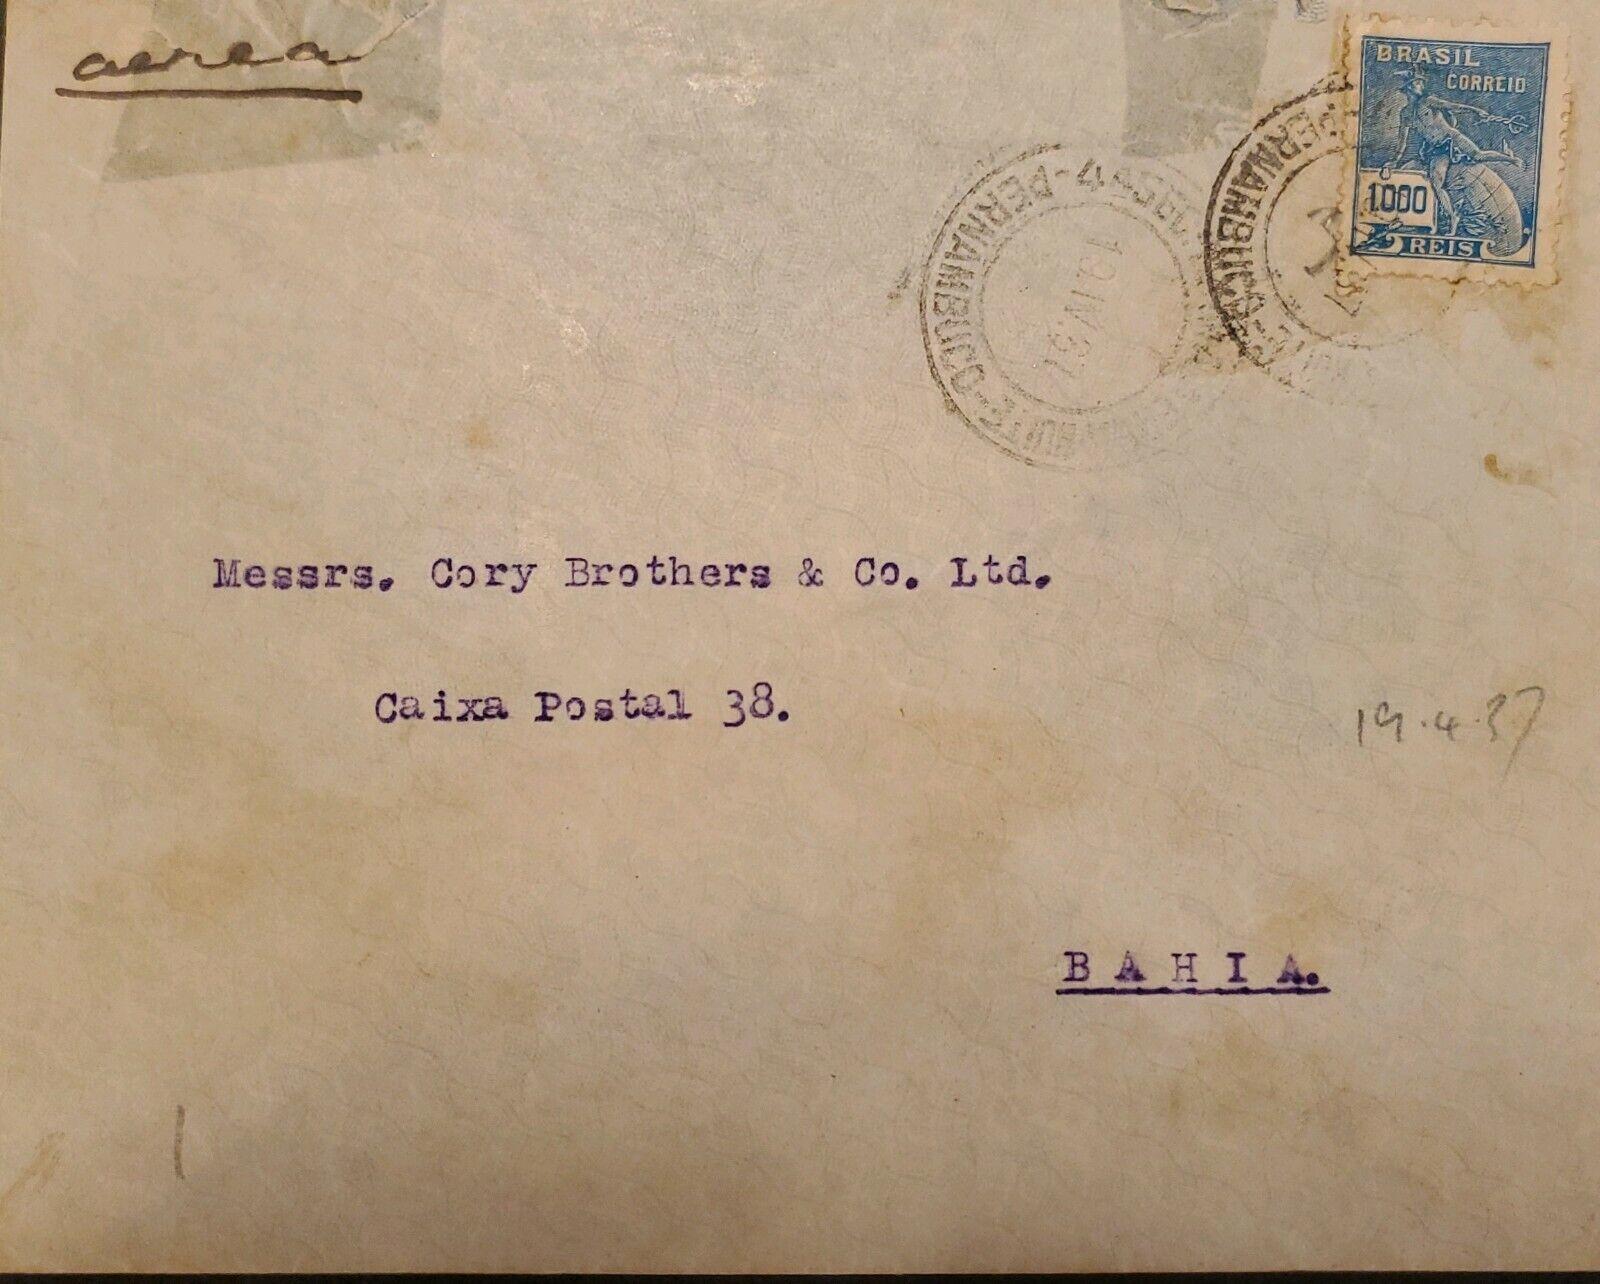 A 1937, BRAZIL, FROM PERNAMBUCO TO BAHIA, COMMERCE STAMP - $25.00